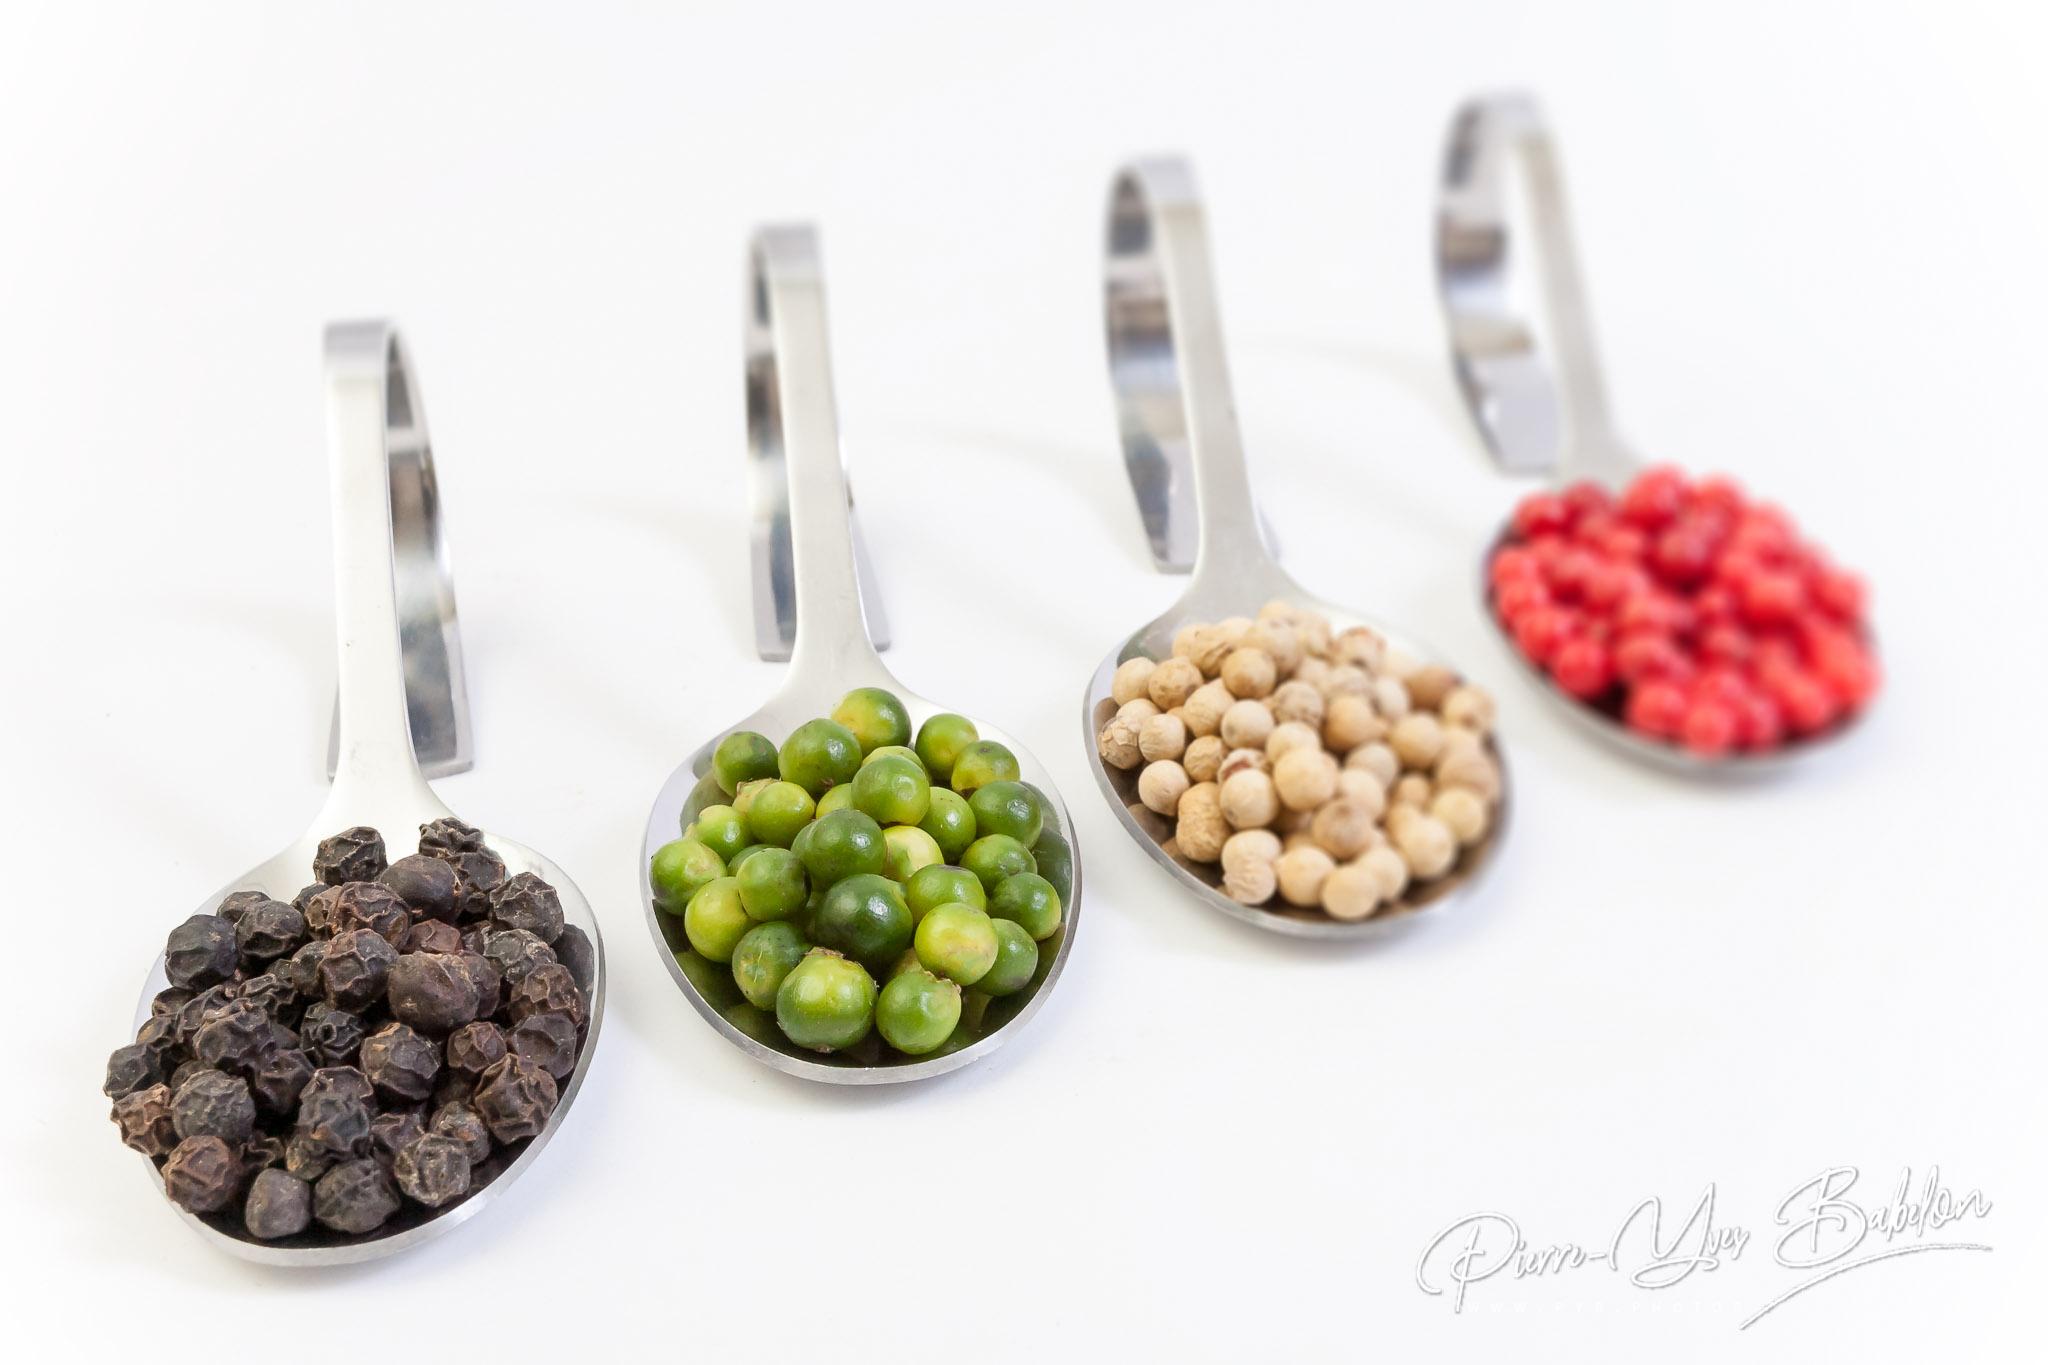 Quatre sortes de grains de poivre dans des cuillères métalliques